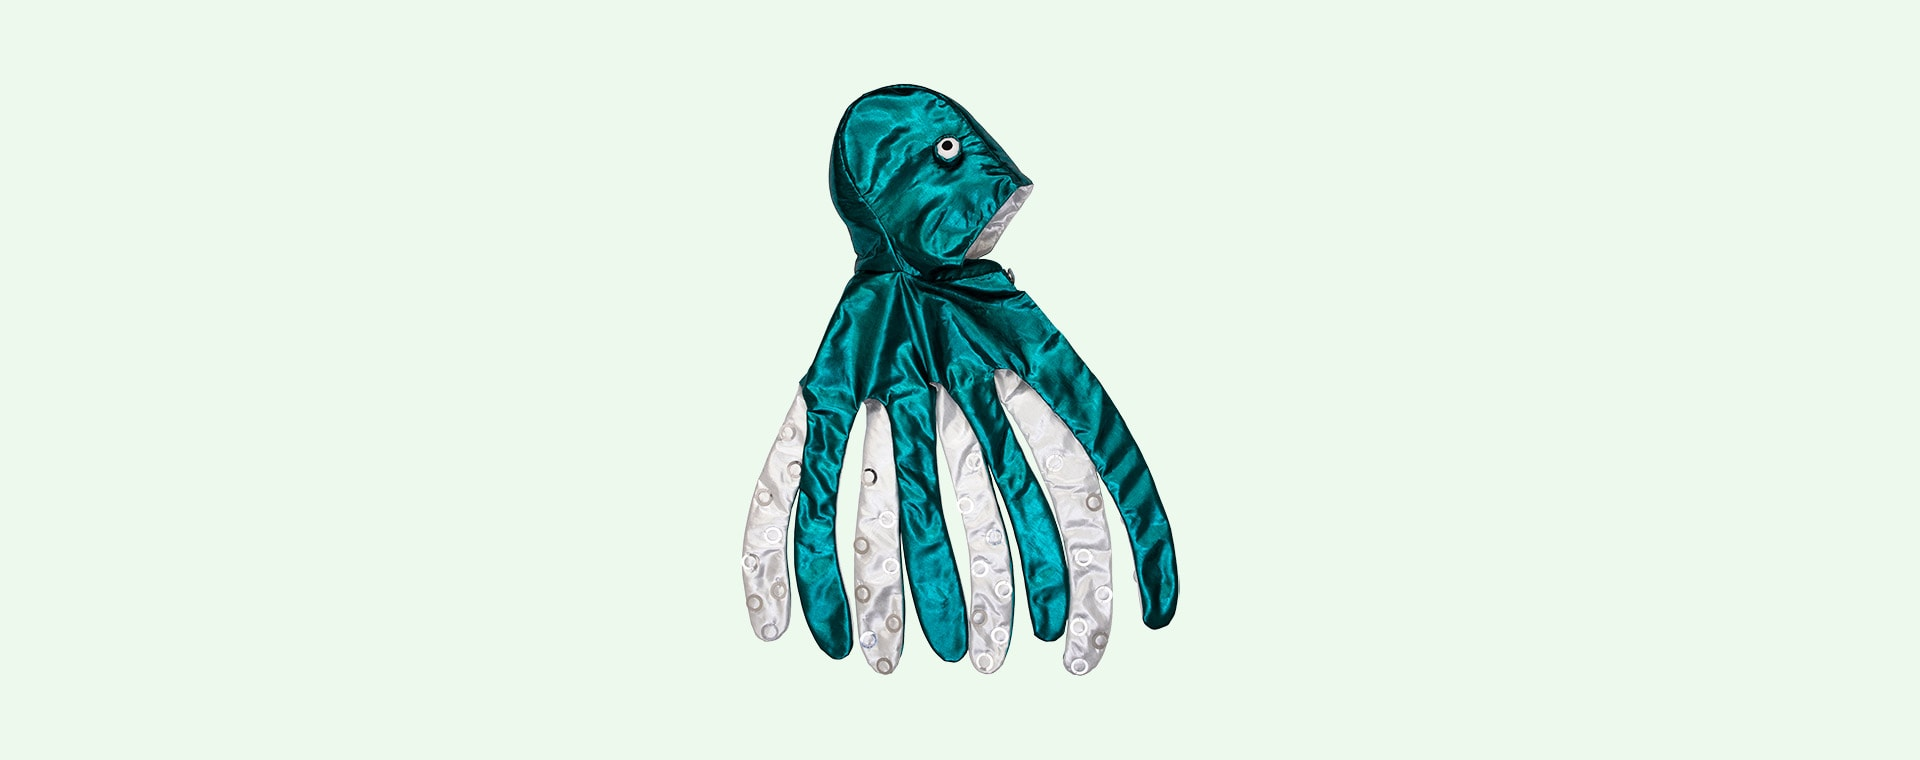 Blue Meri Meri Octopus Dress Up